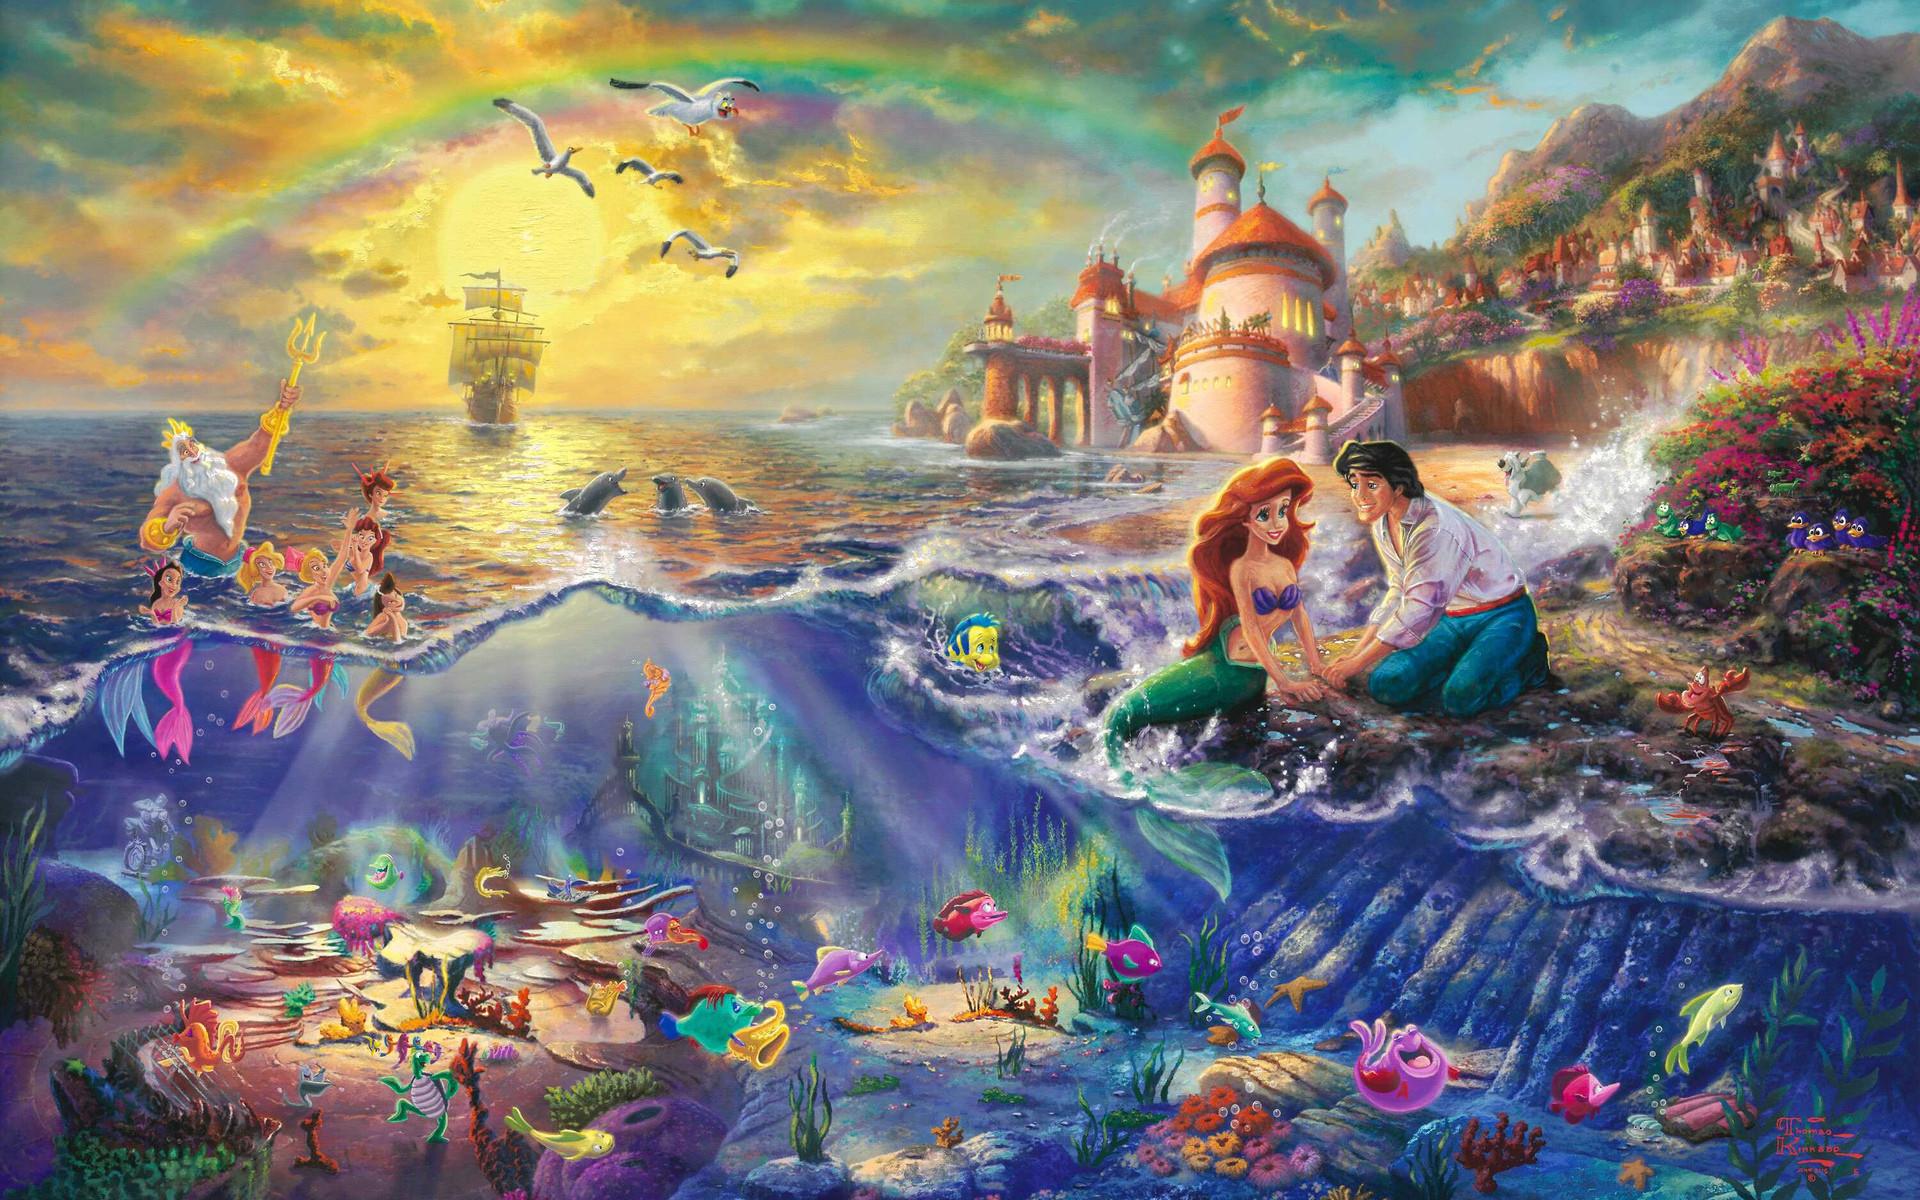 Fine art desktop wallpaper 60 images 2560x1600 arts salvador dali la metamorfosi fine art paintings la metamorfosi salvador voltagebd Image collections